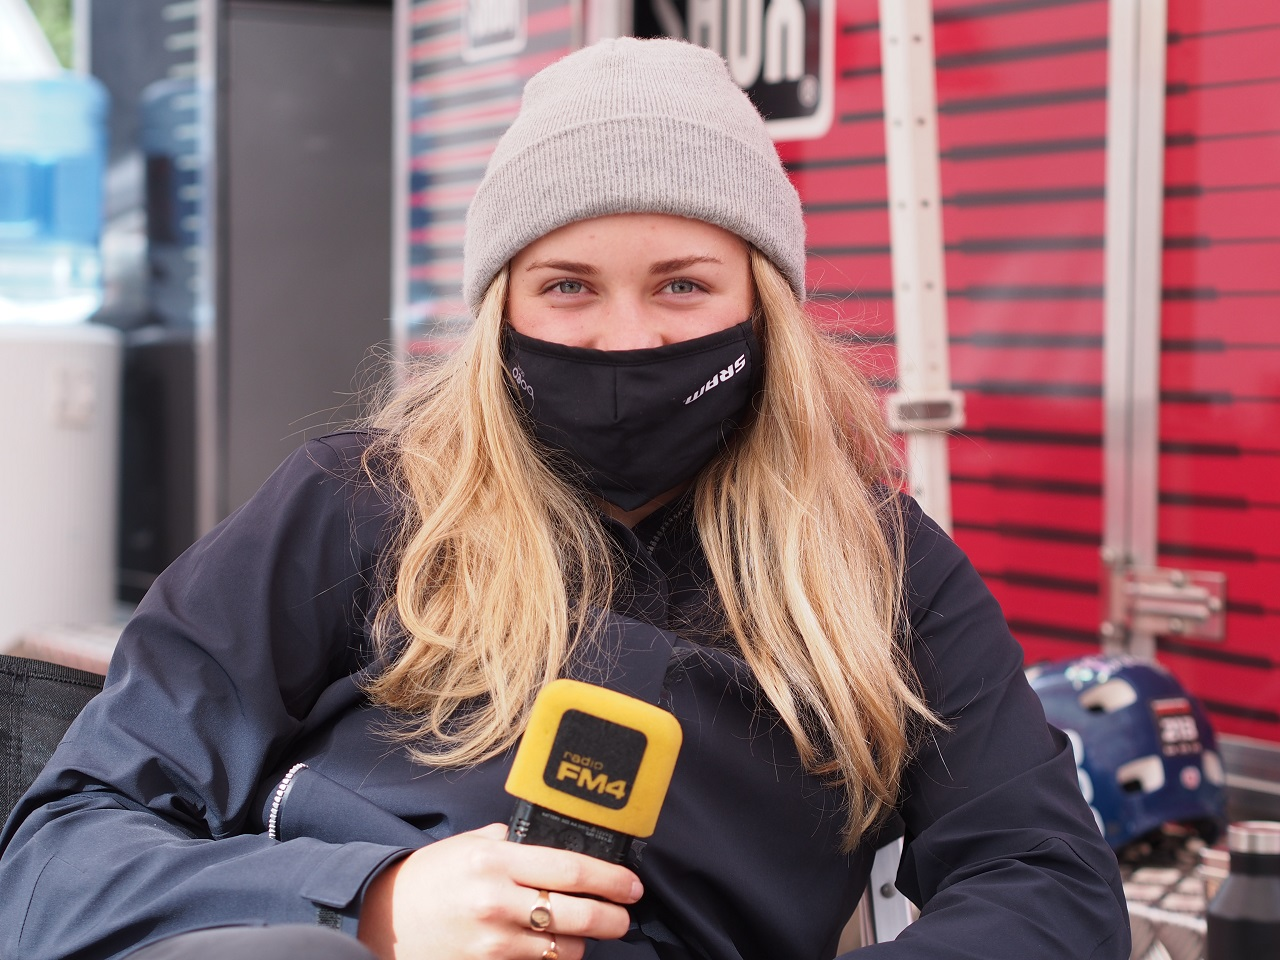 Vali Höll mit Maske beim Crankworx 2020